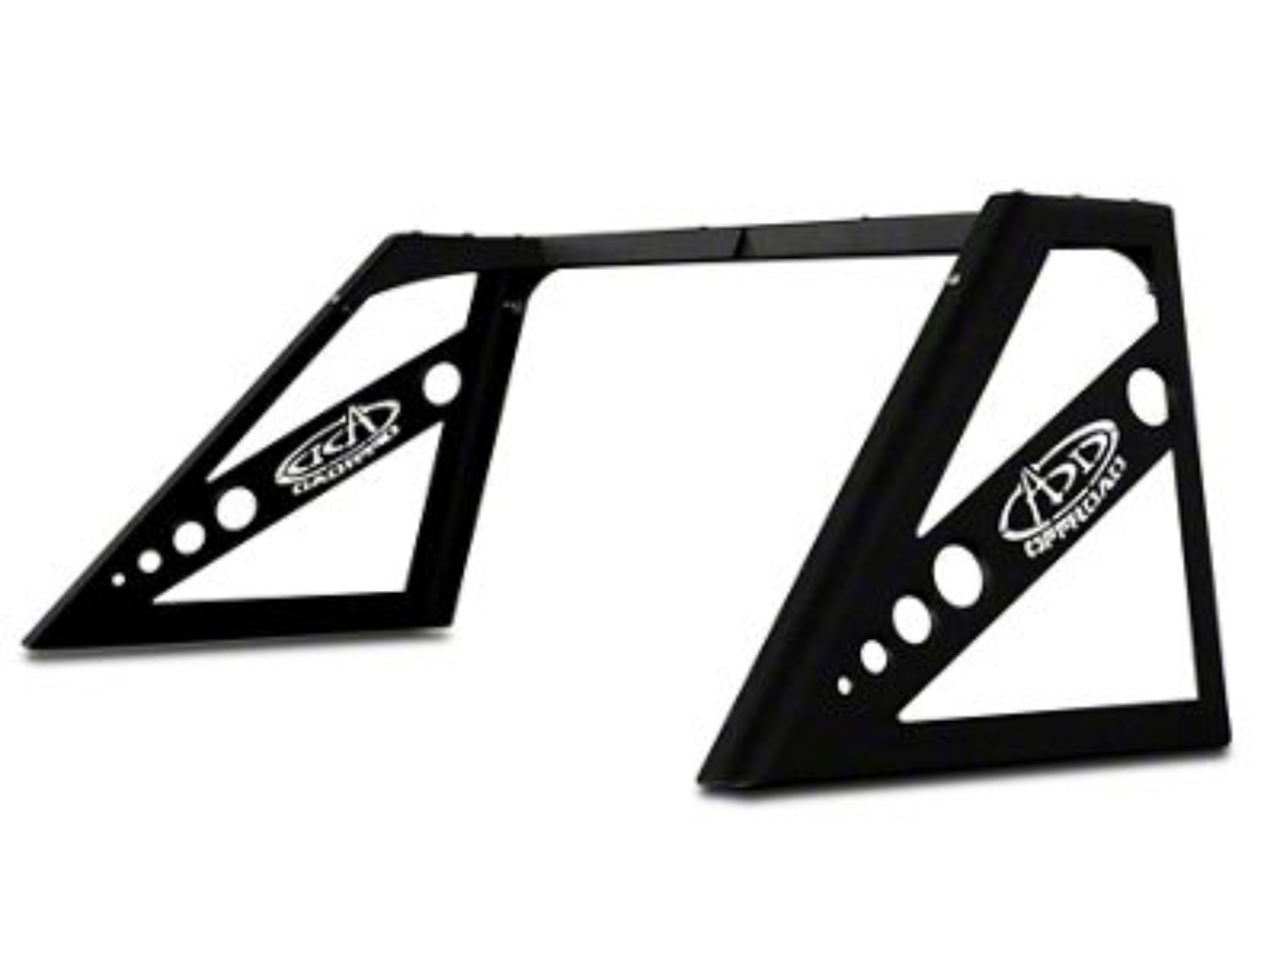 Addictive Desert Designs Style Rax Chase Rack (02-19 RAM 1500)